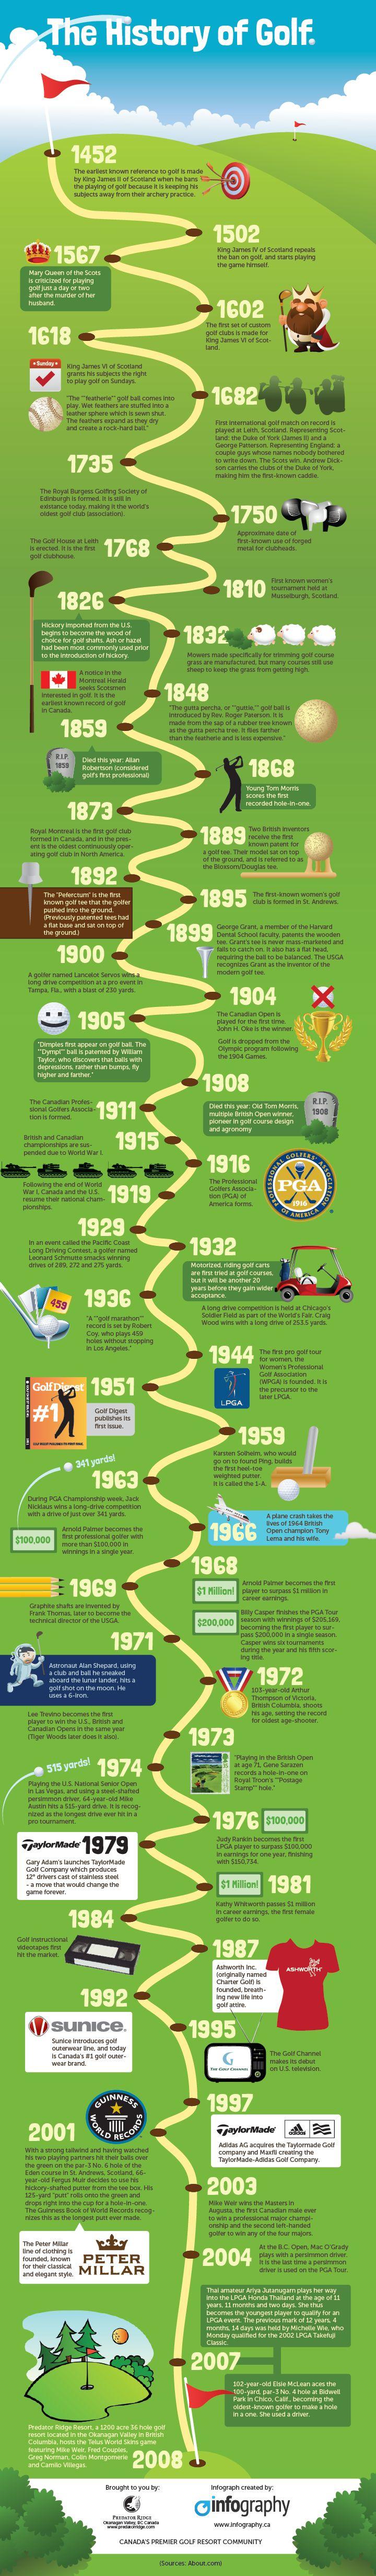 The History of Golf by Predator Ridge Golf Resort in the Okanagan Valley (Vernon, BC) Canada. #VernonBC @Predator Ridge Resort